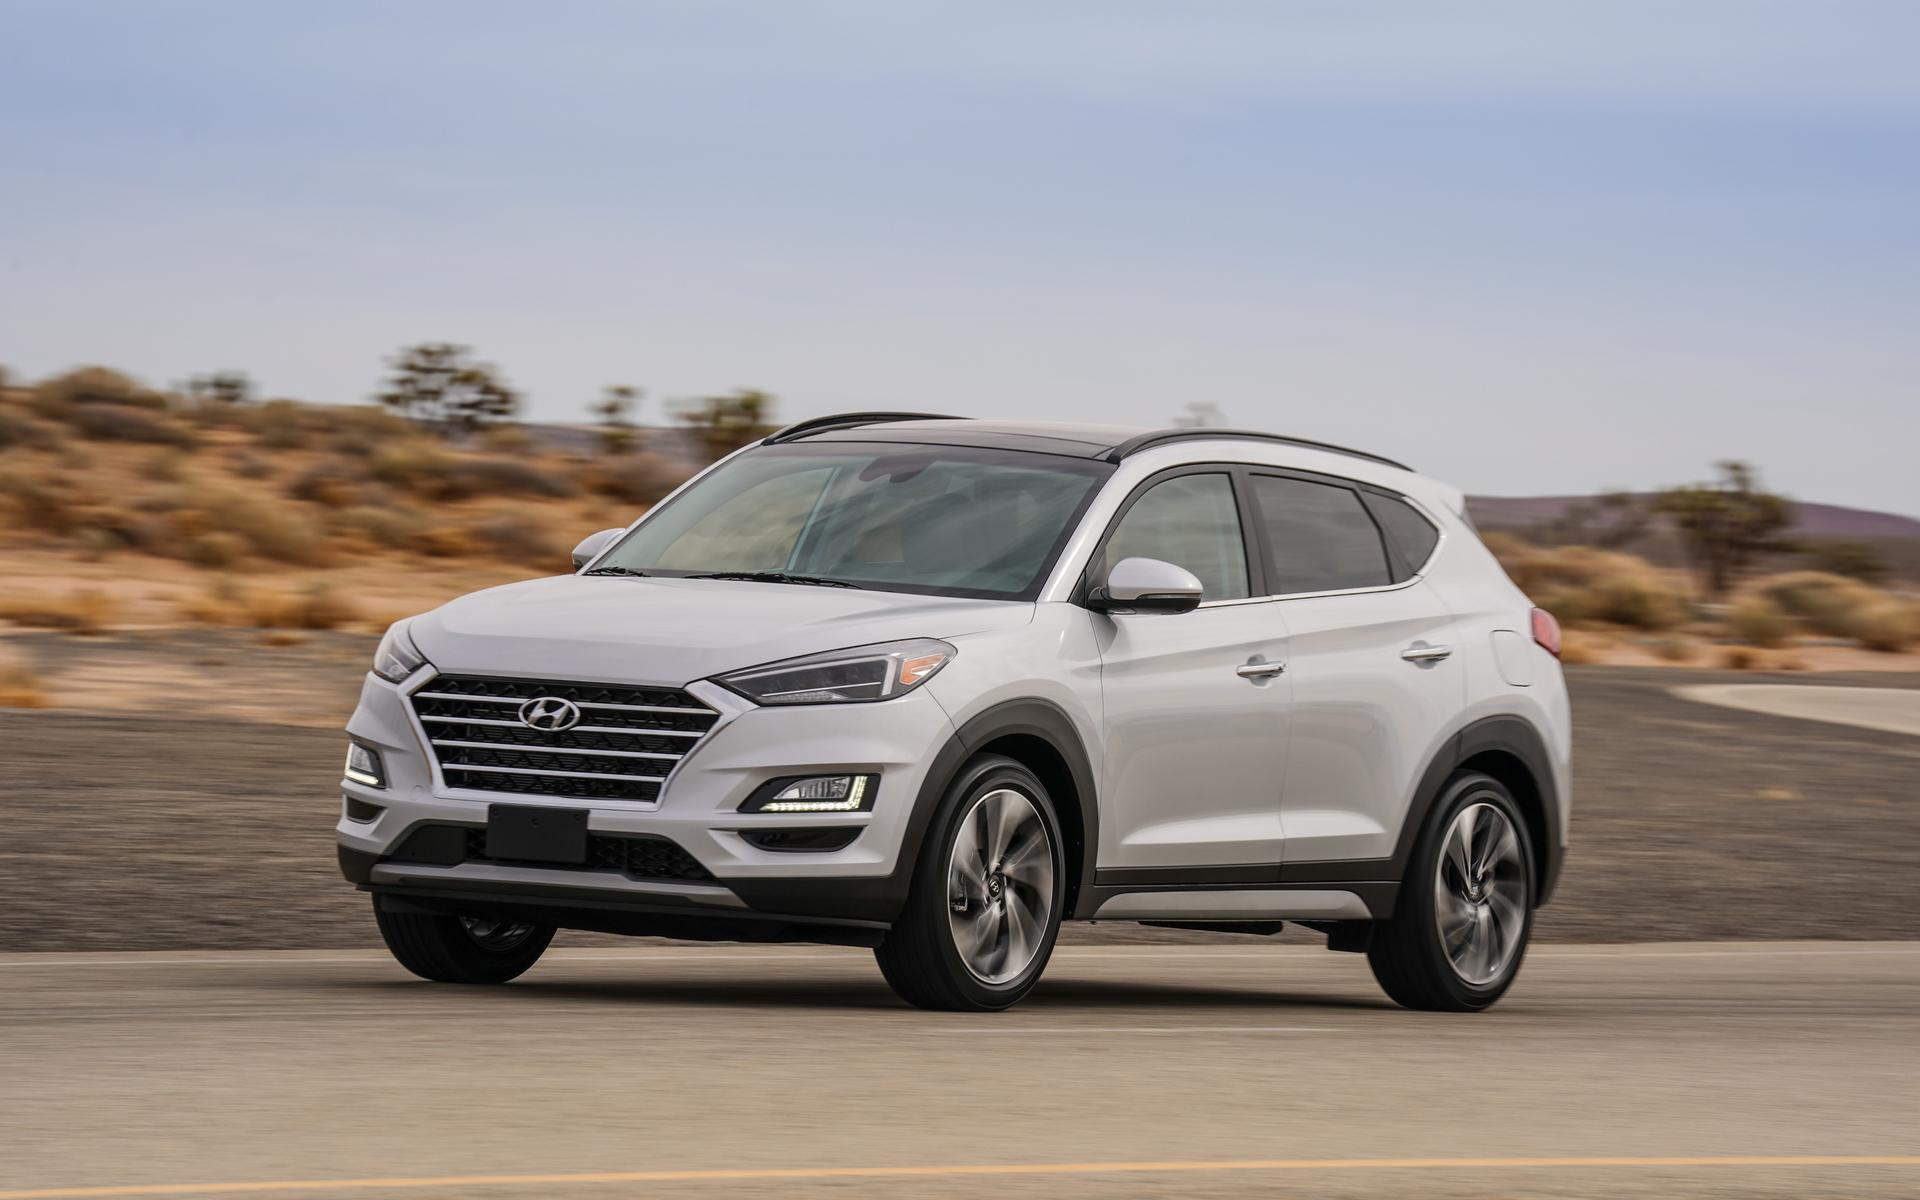 Hyundai Tucson 2019: En perte de vitesse? - Guide Auto